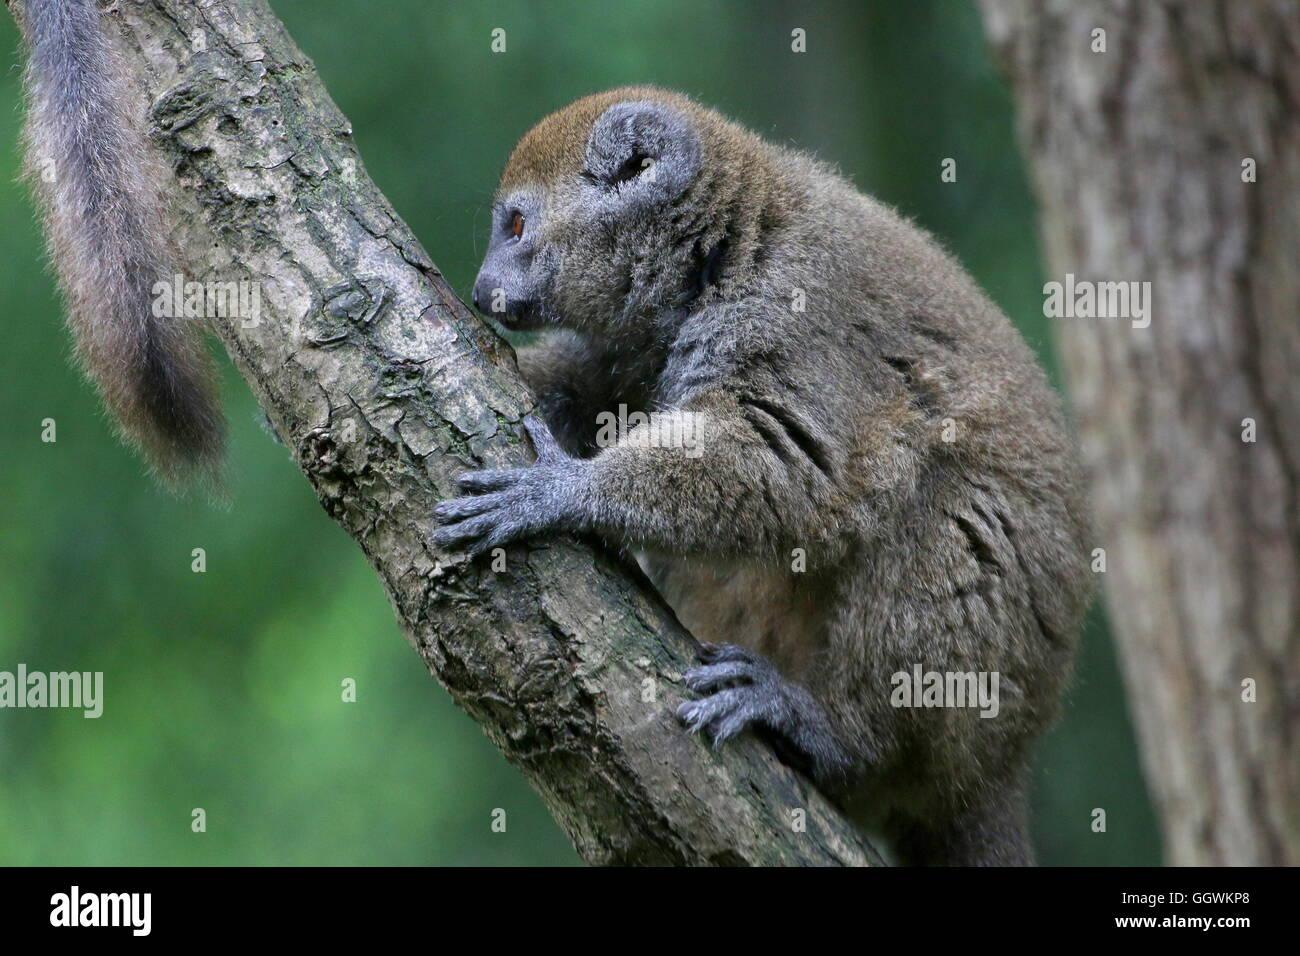 Madagascar Lac Alaotra bamboo lemur (Hapalemur alaotrensis), a.k.a.  Alaotran gentle lemur. - Stock Image